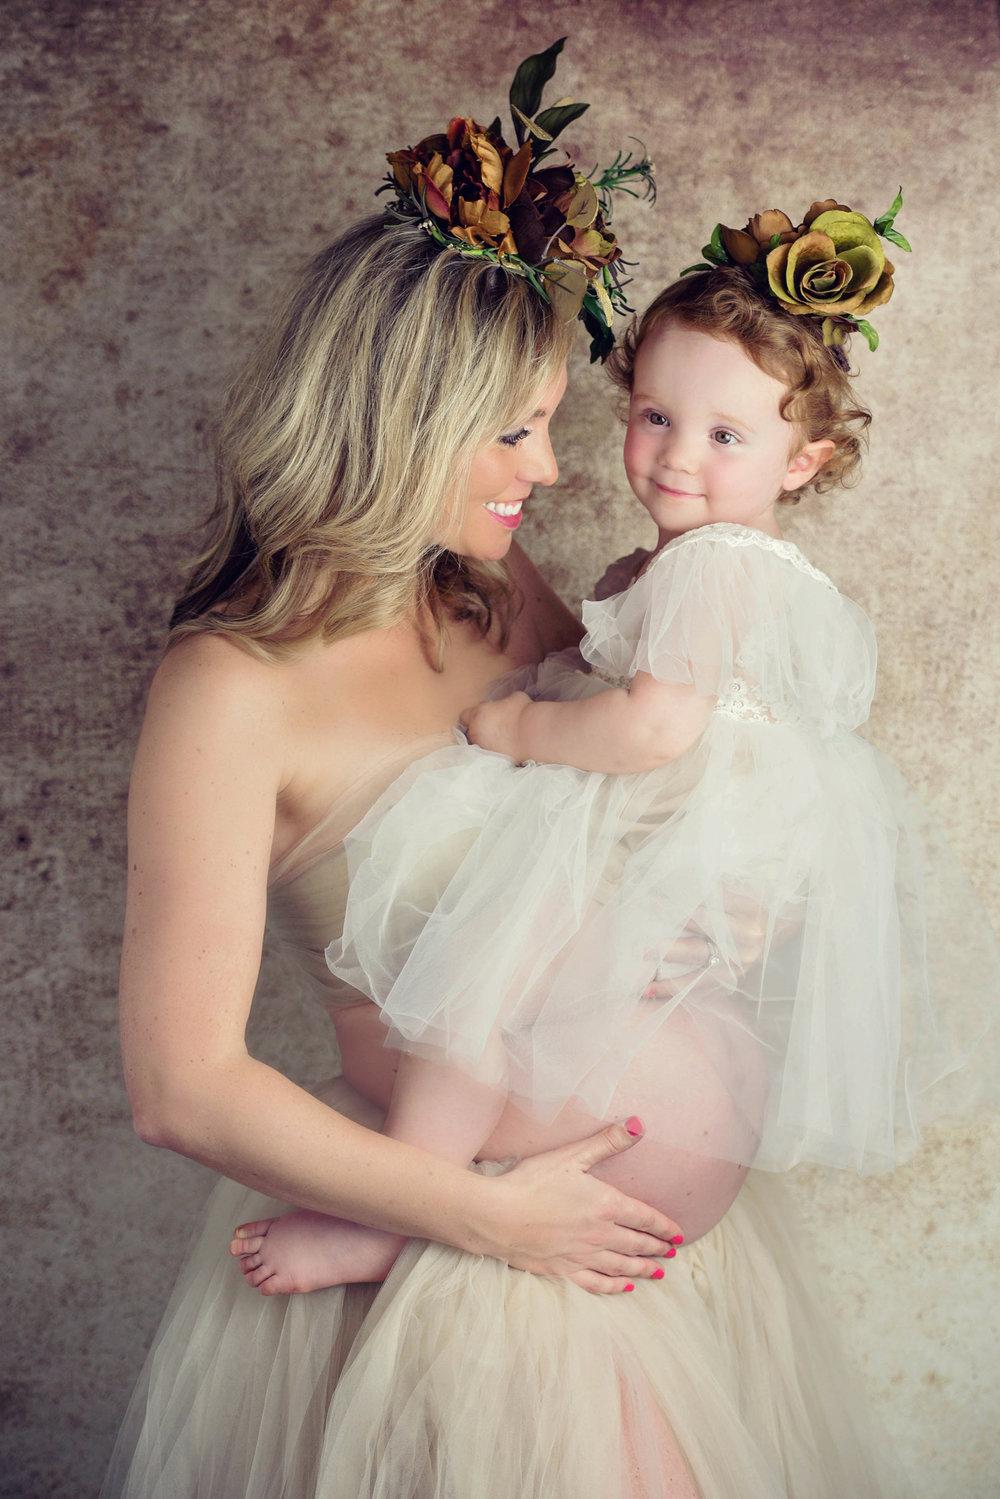 Maternitybabies_30.jpg